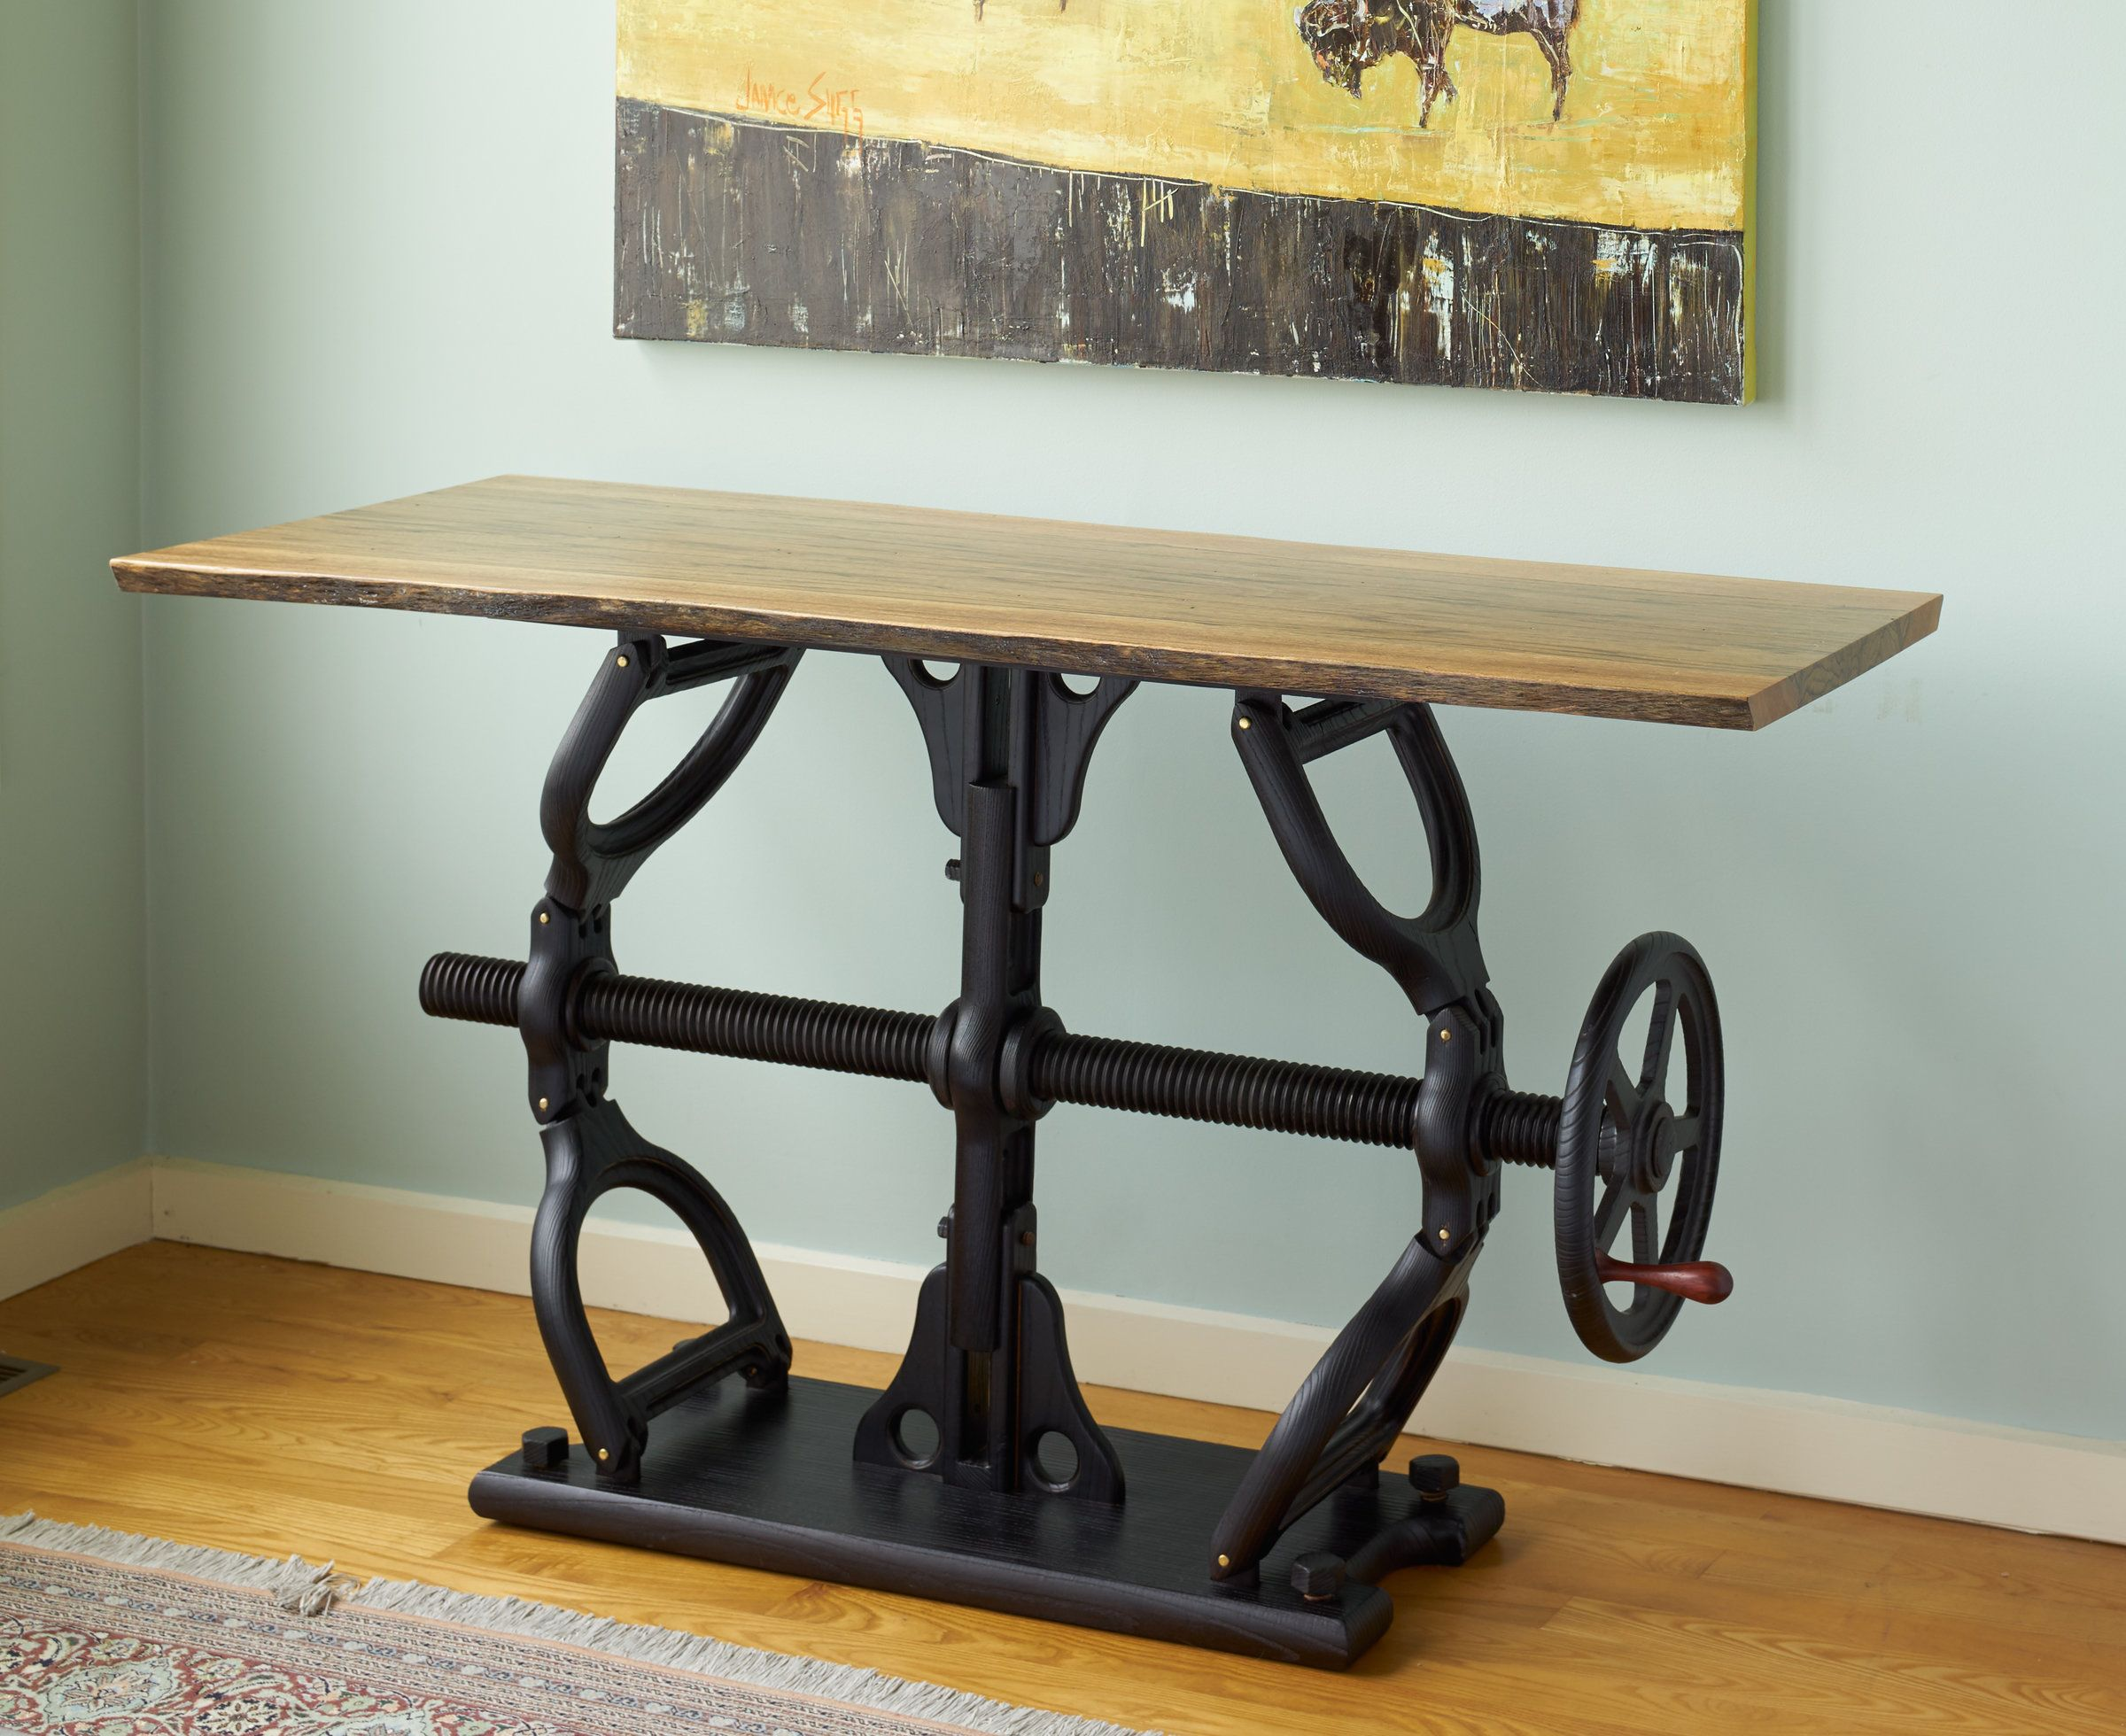 Crank Table By James Pearce Wood Console Table Organic Shapes  # Muebles Estilo Pearce